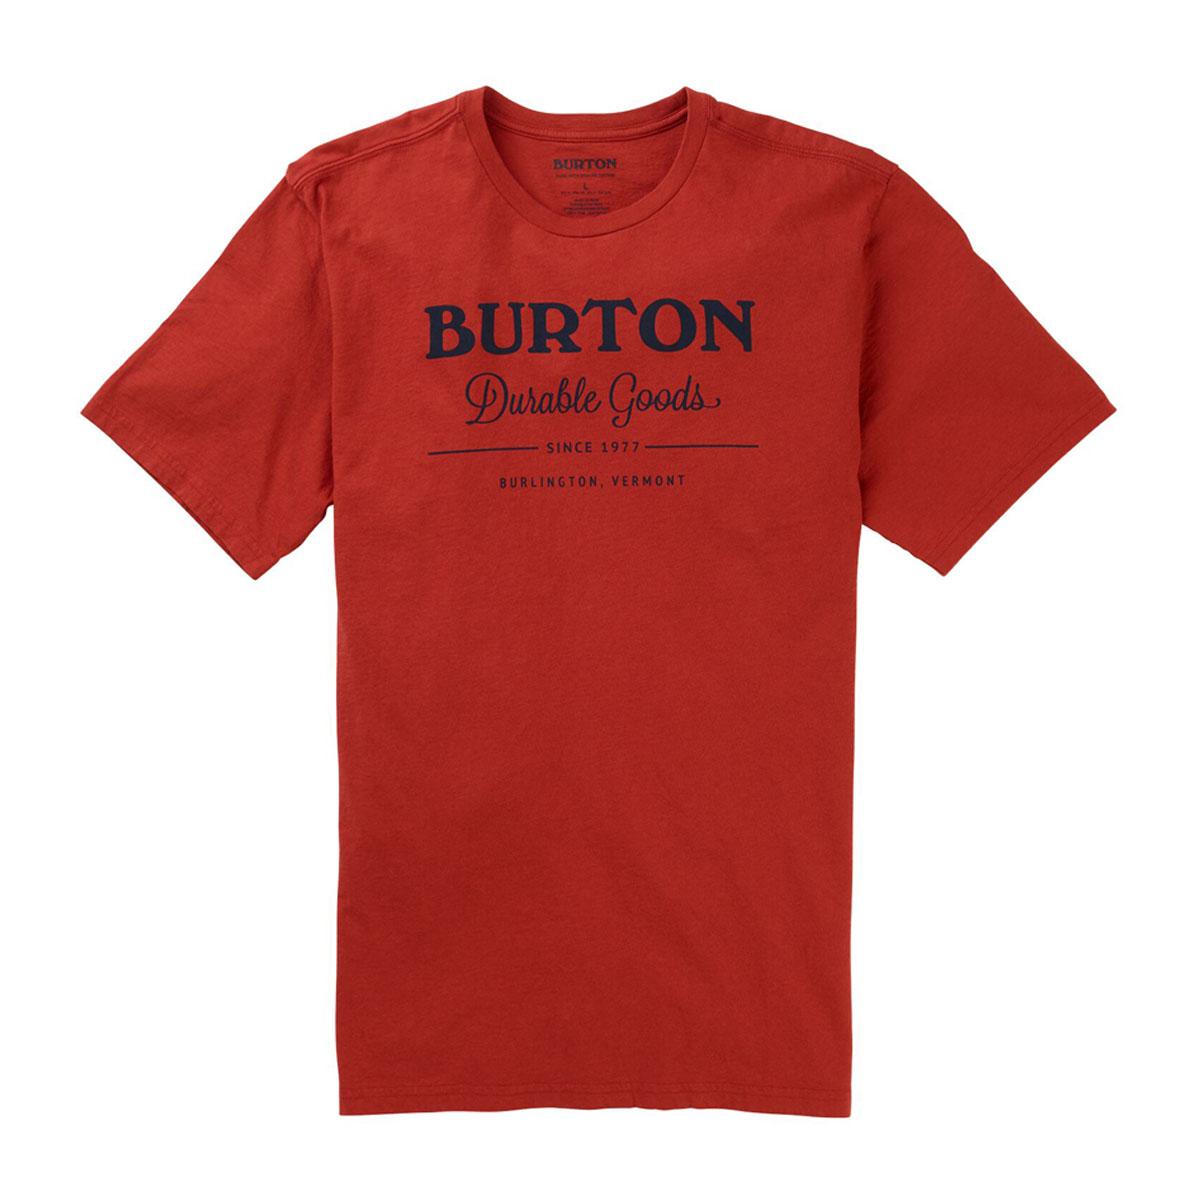 Burton MB DURABLE GDS SS